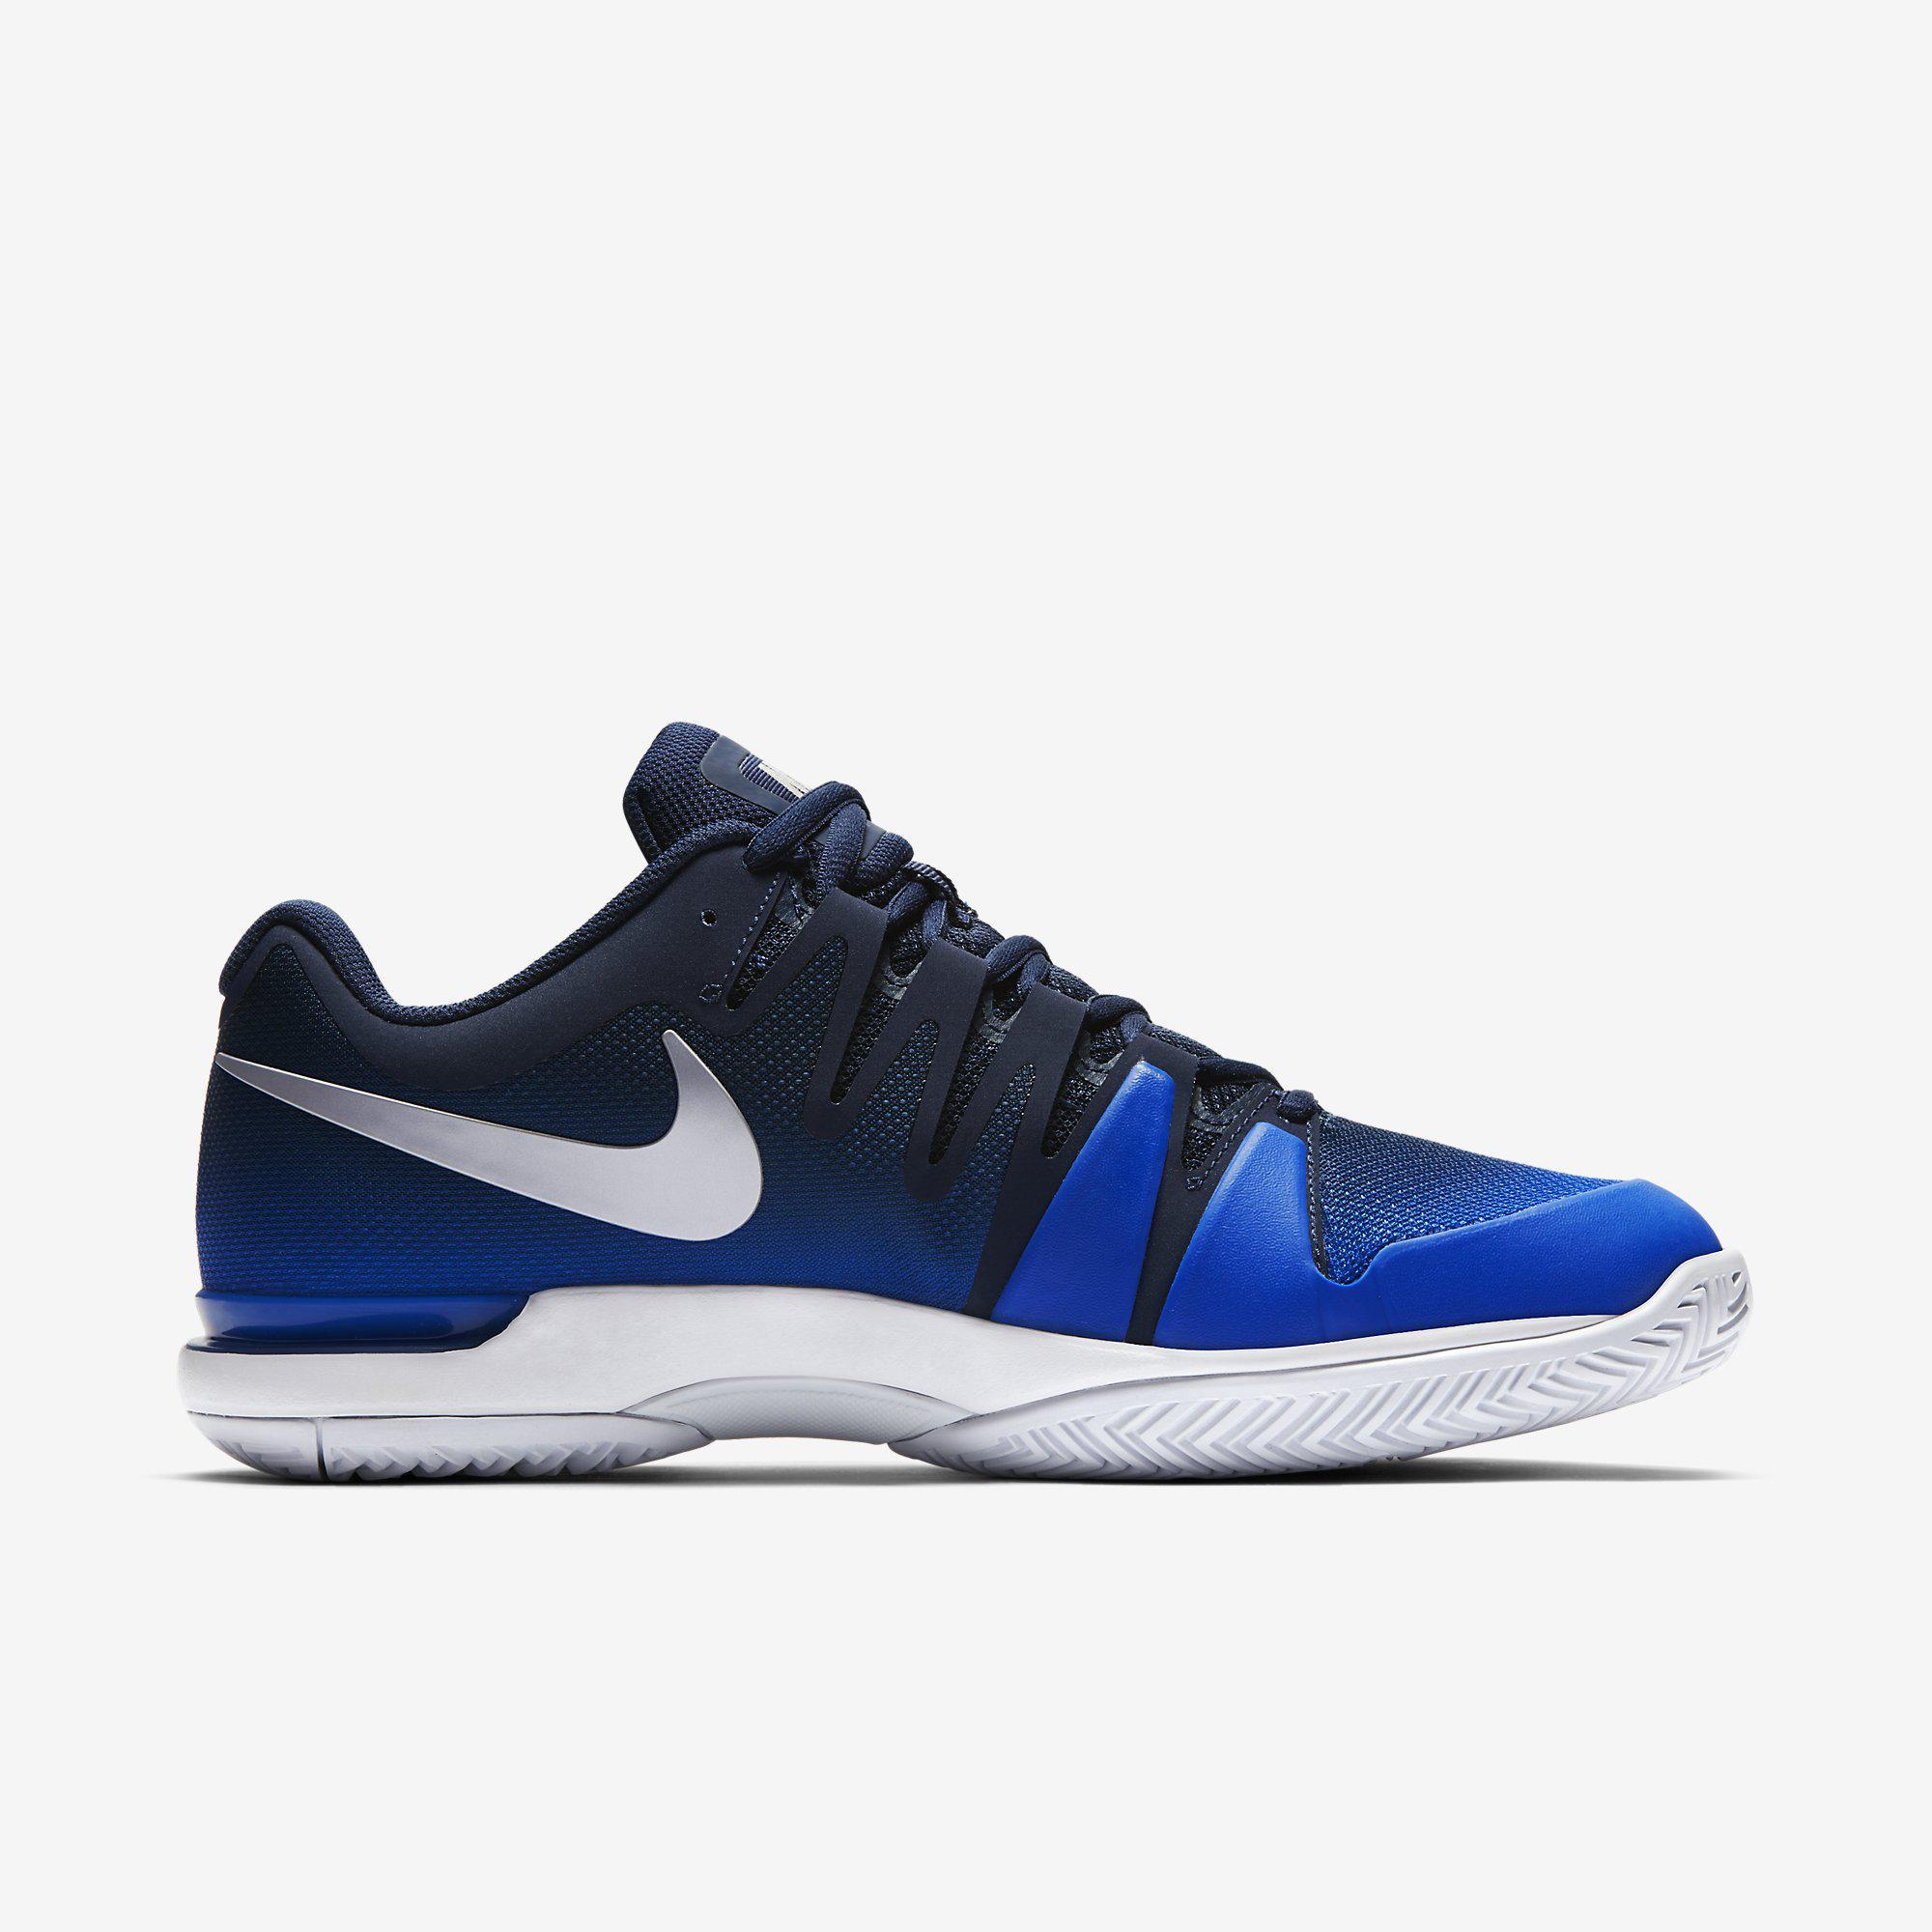 Nike Zoom Vapor   Tour Tennis Shoes